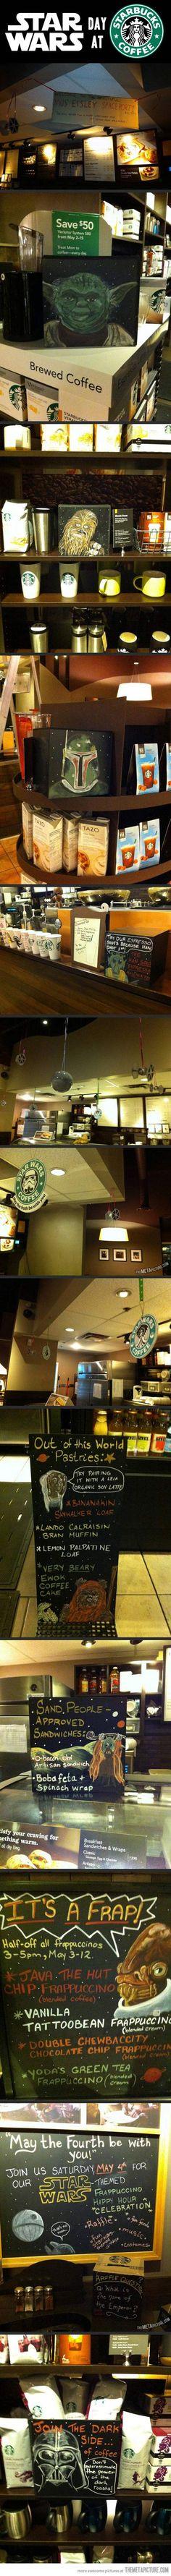 A long time ago in a coffee shop far, far away…